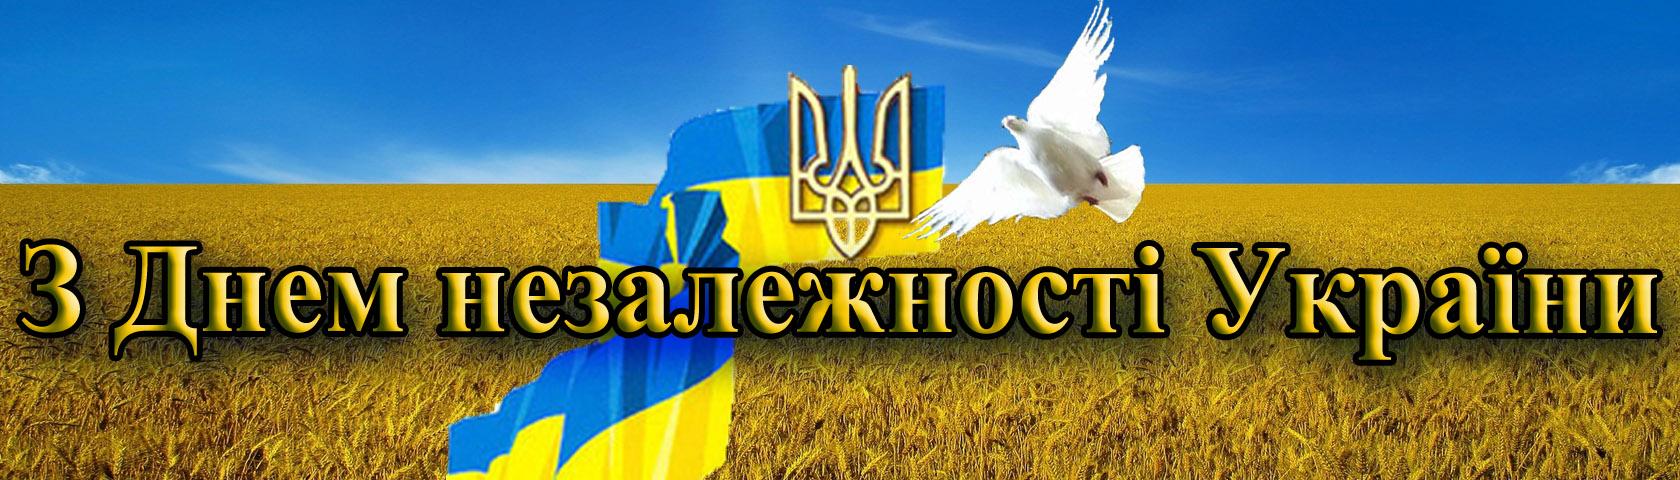 "Результат пошуку зображень за запитом ""вітання з днем незалежності україни"""